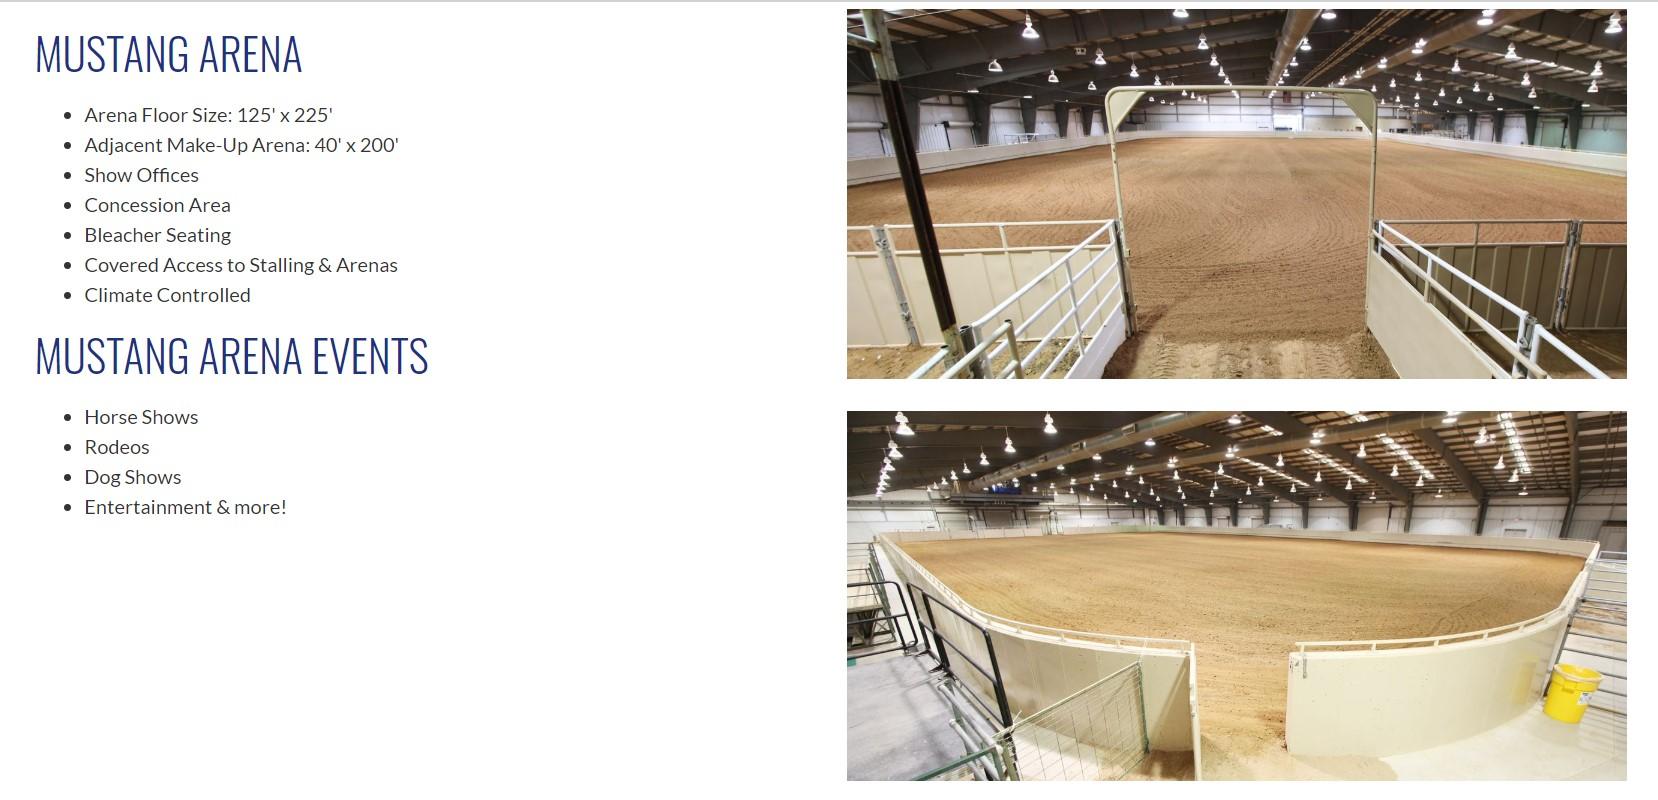 Mustang Arena Details